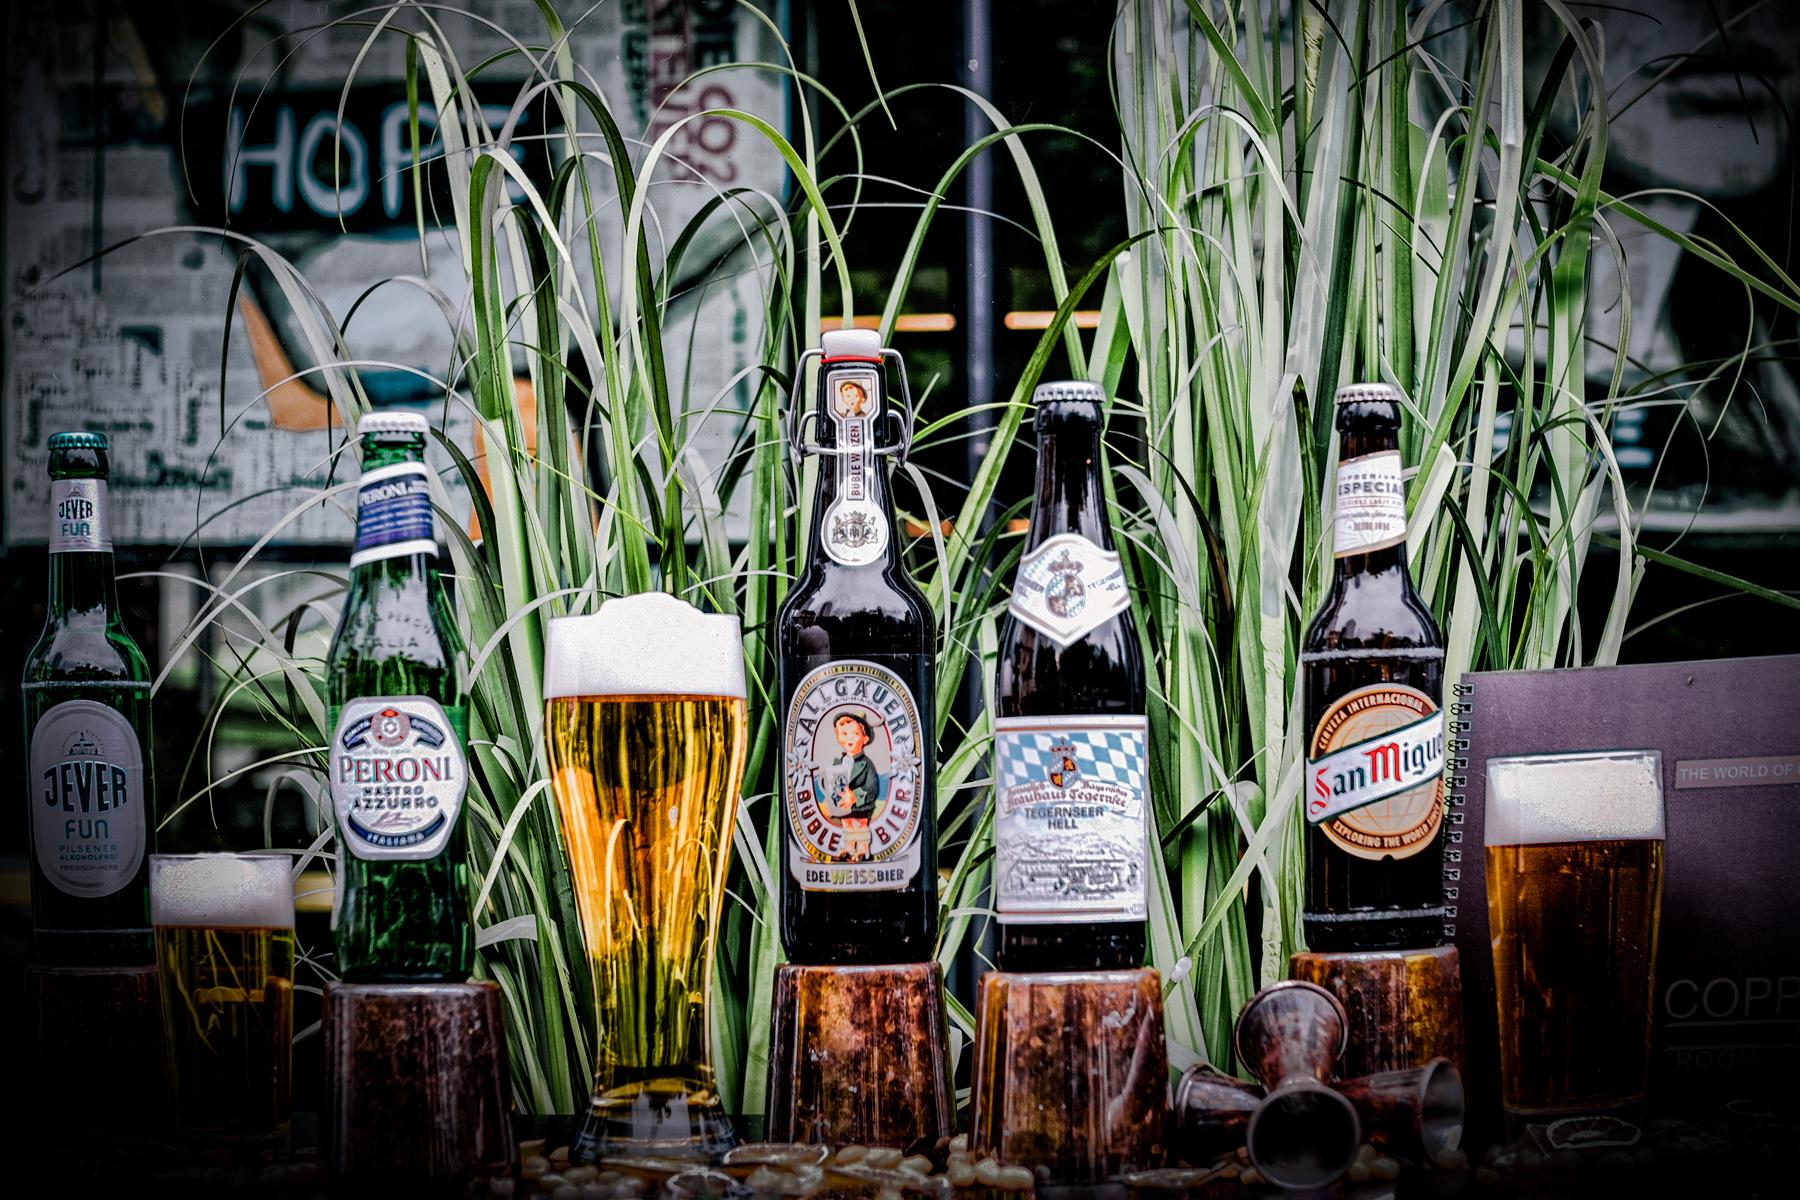 bier beer die sieger mannschaft copper bar restaurant room frankfurt alte oper events food drinks lounge